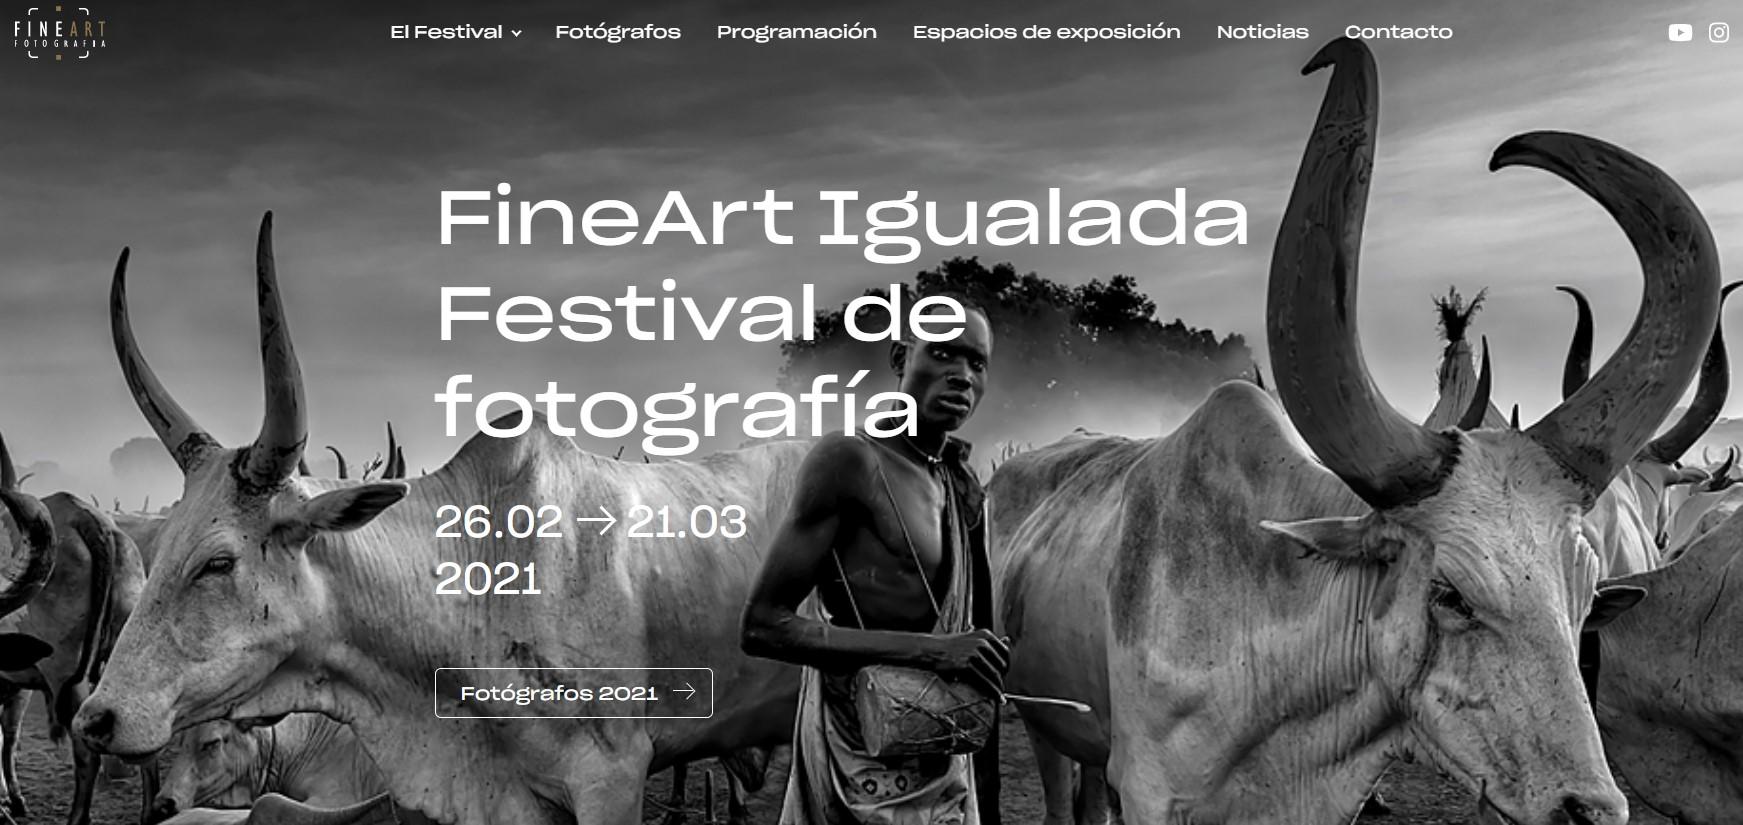 Fine-Art_Igualada.jpg